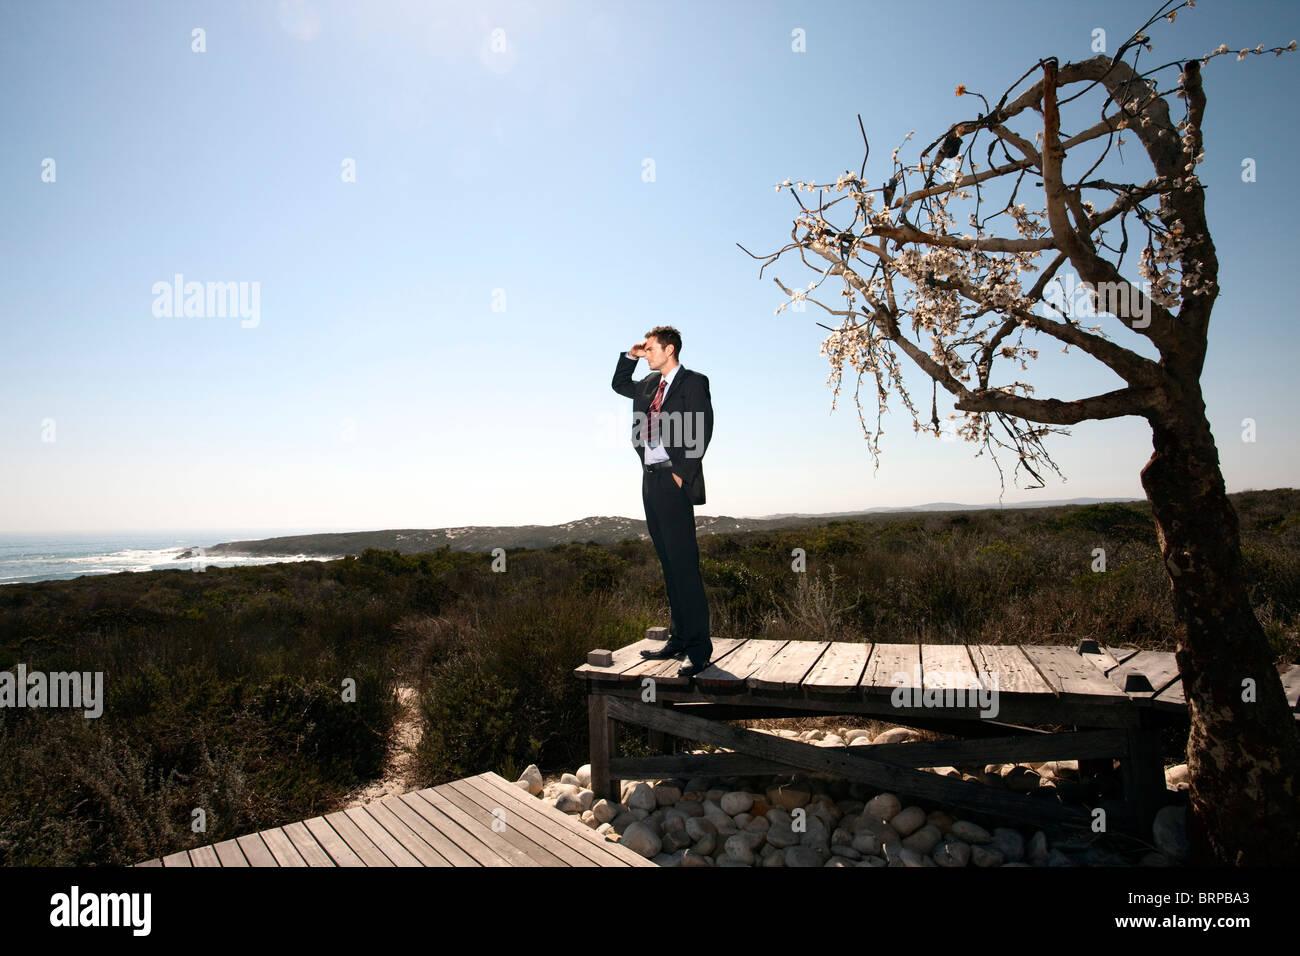 Business man in barren landscape - Stock Image